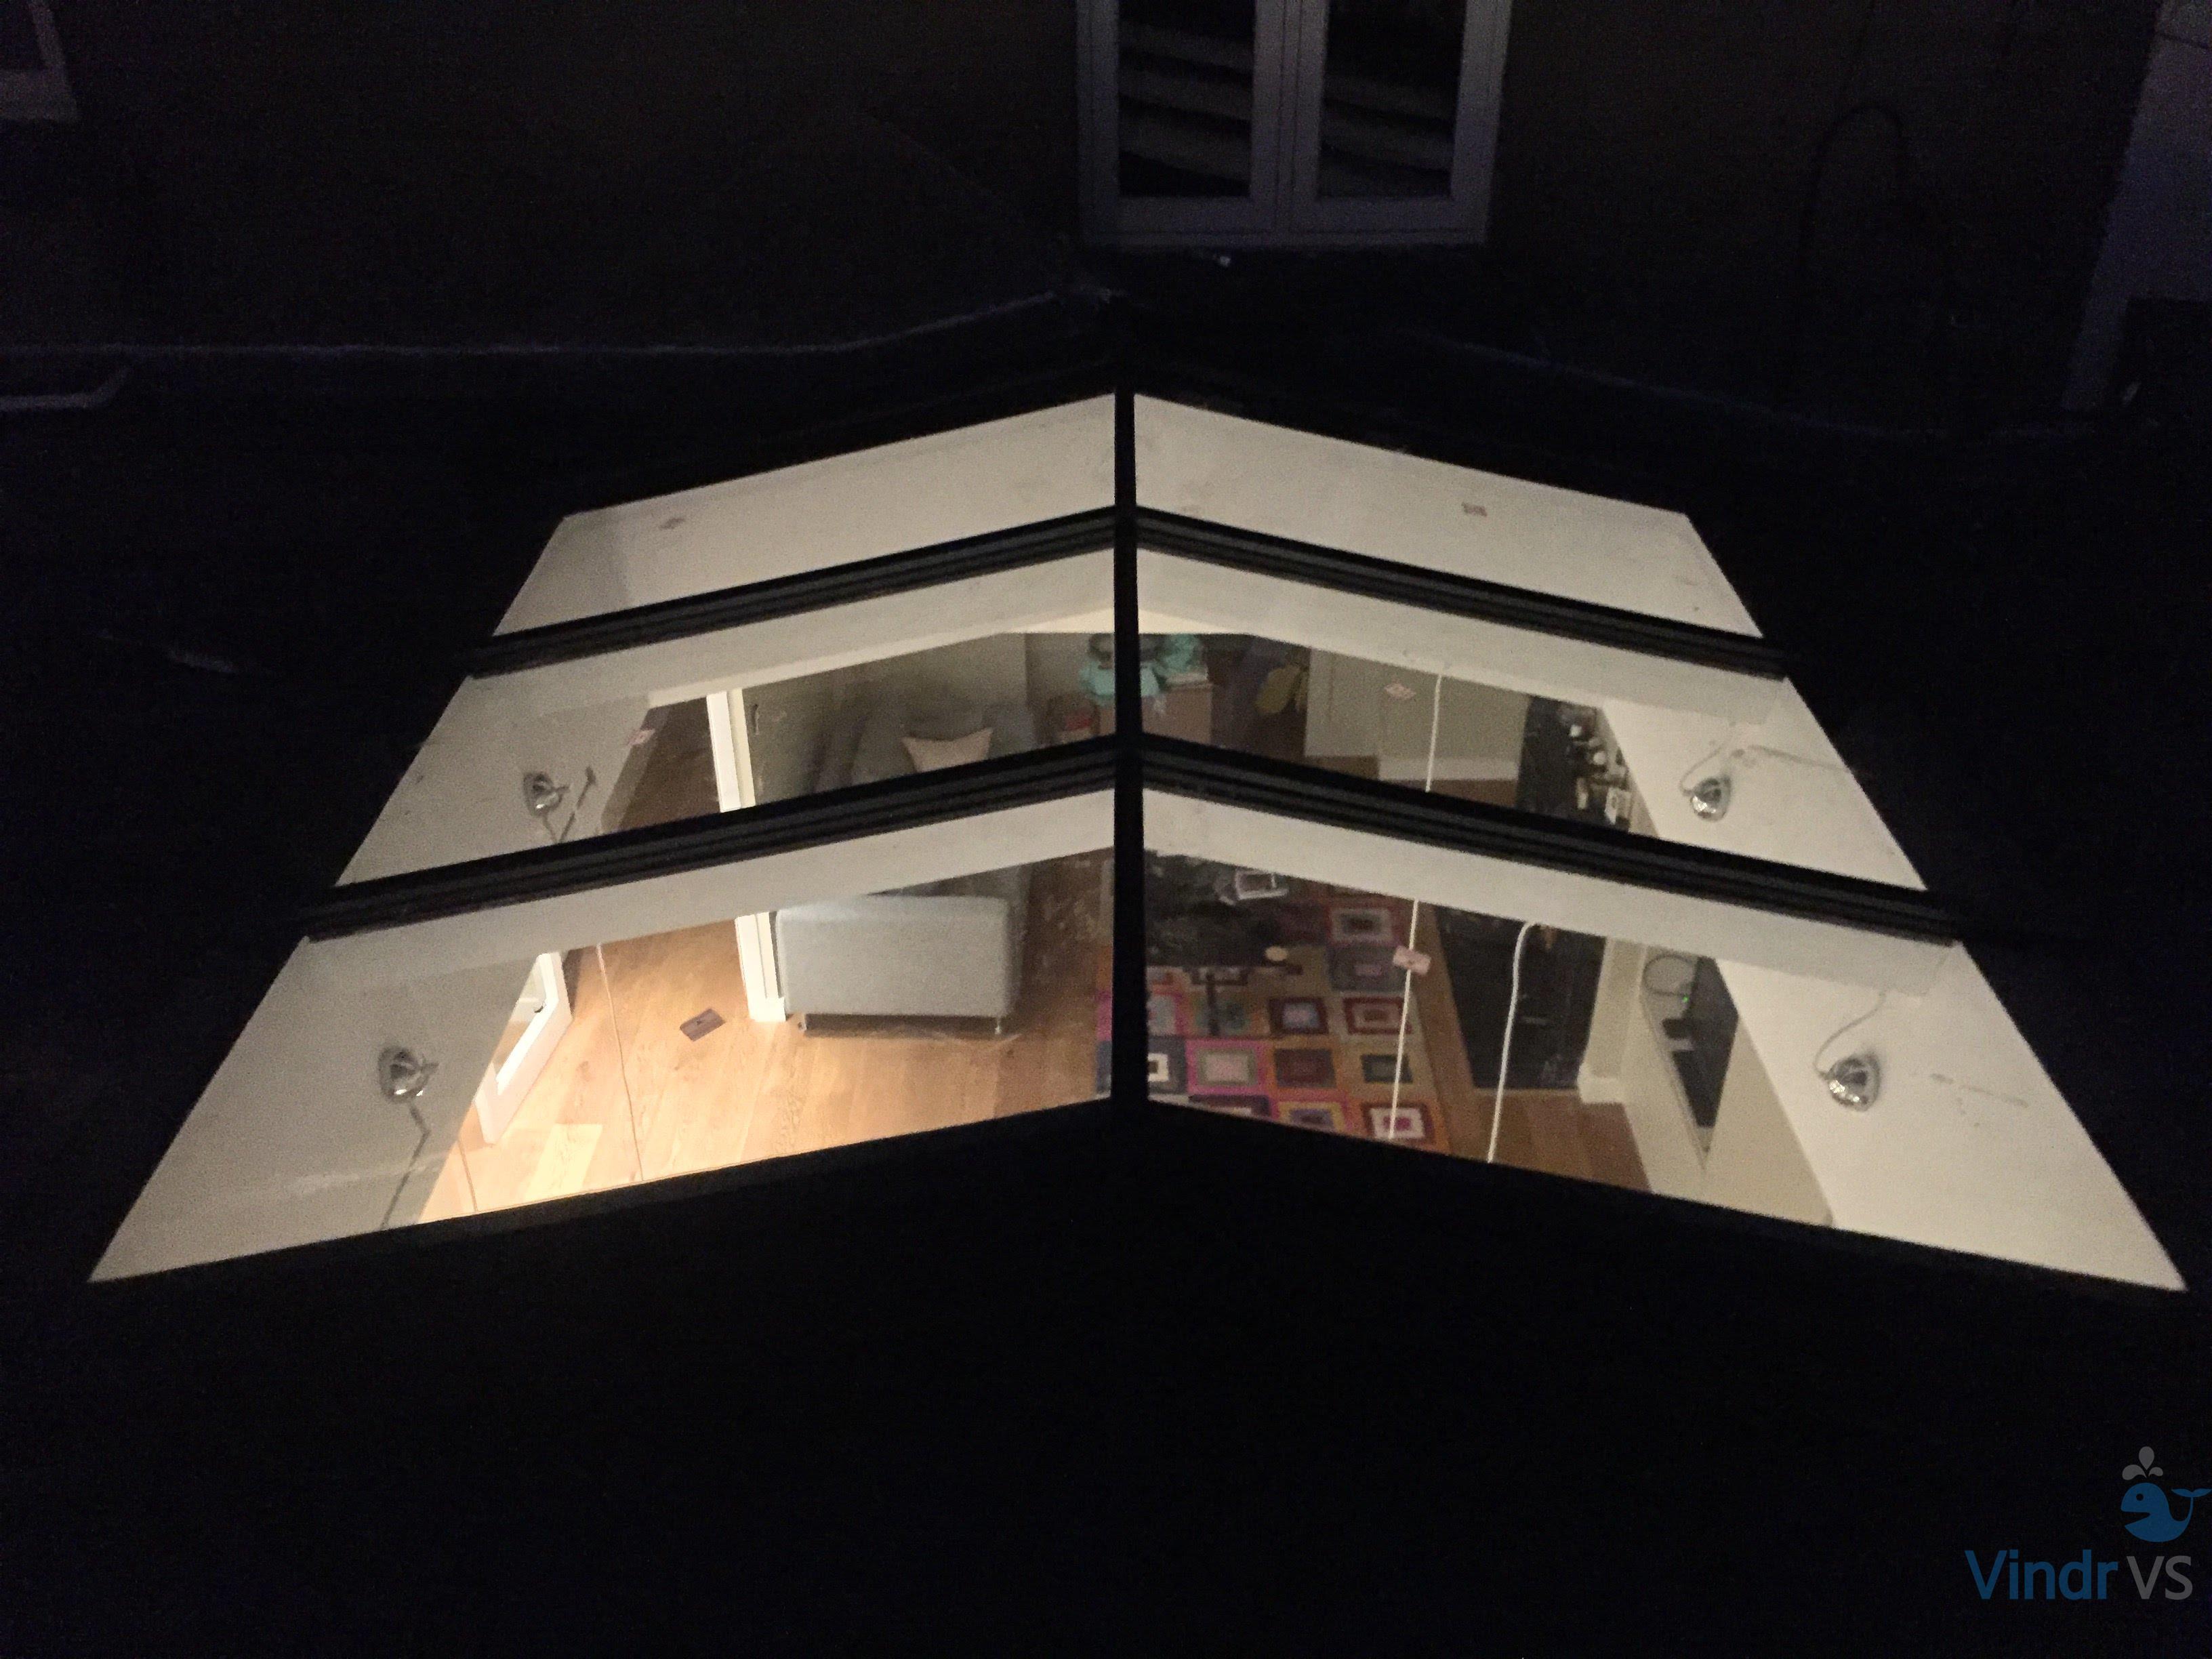 Roof Lights Vindr Vs